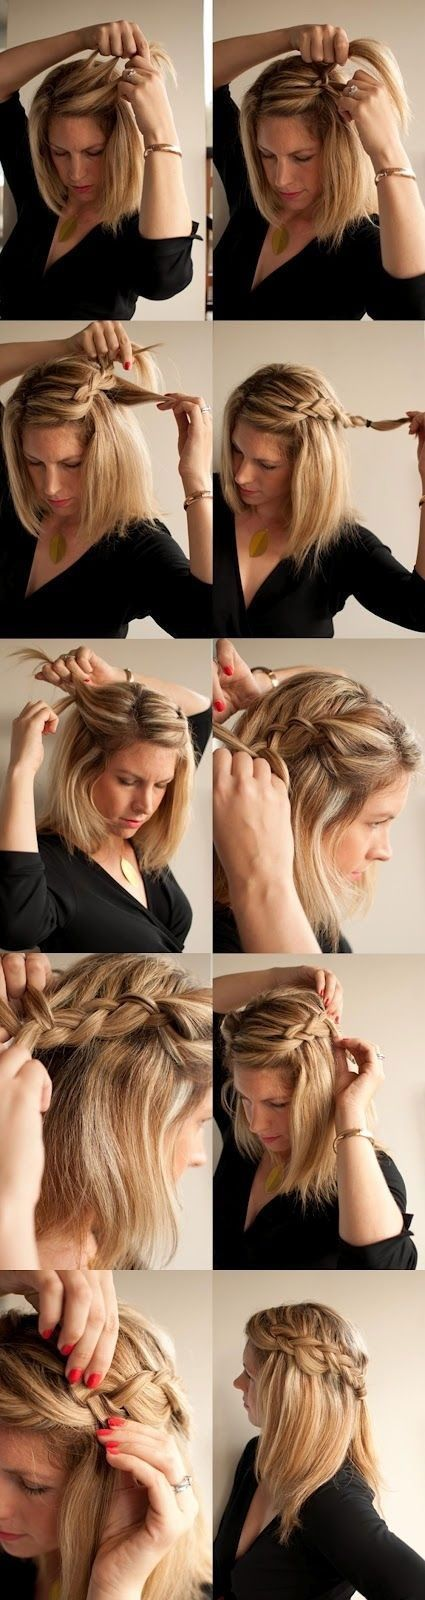 15 Cute and Easy Hairstyle Tutorials For Medium-Length Hair | Easy ...